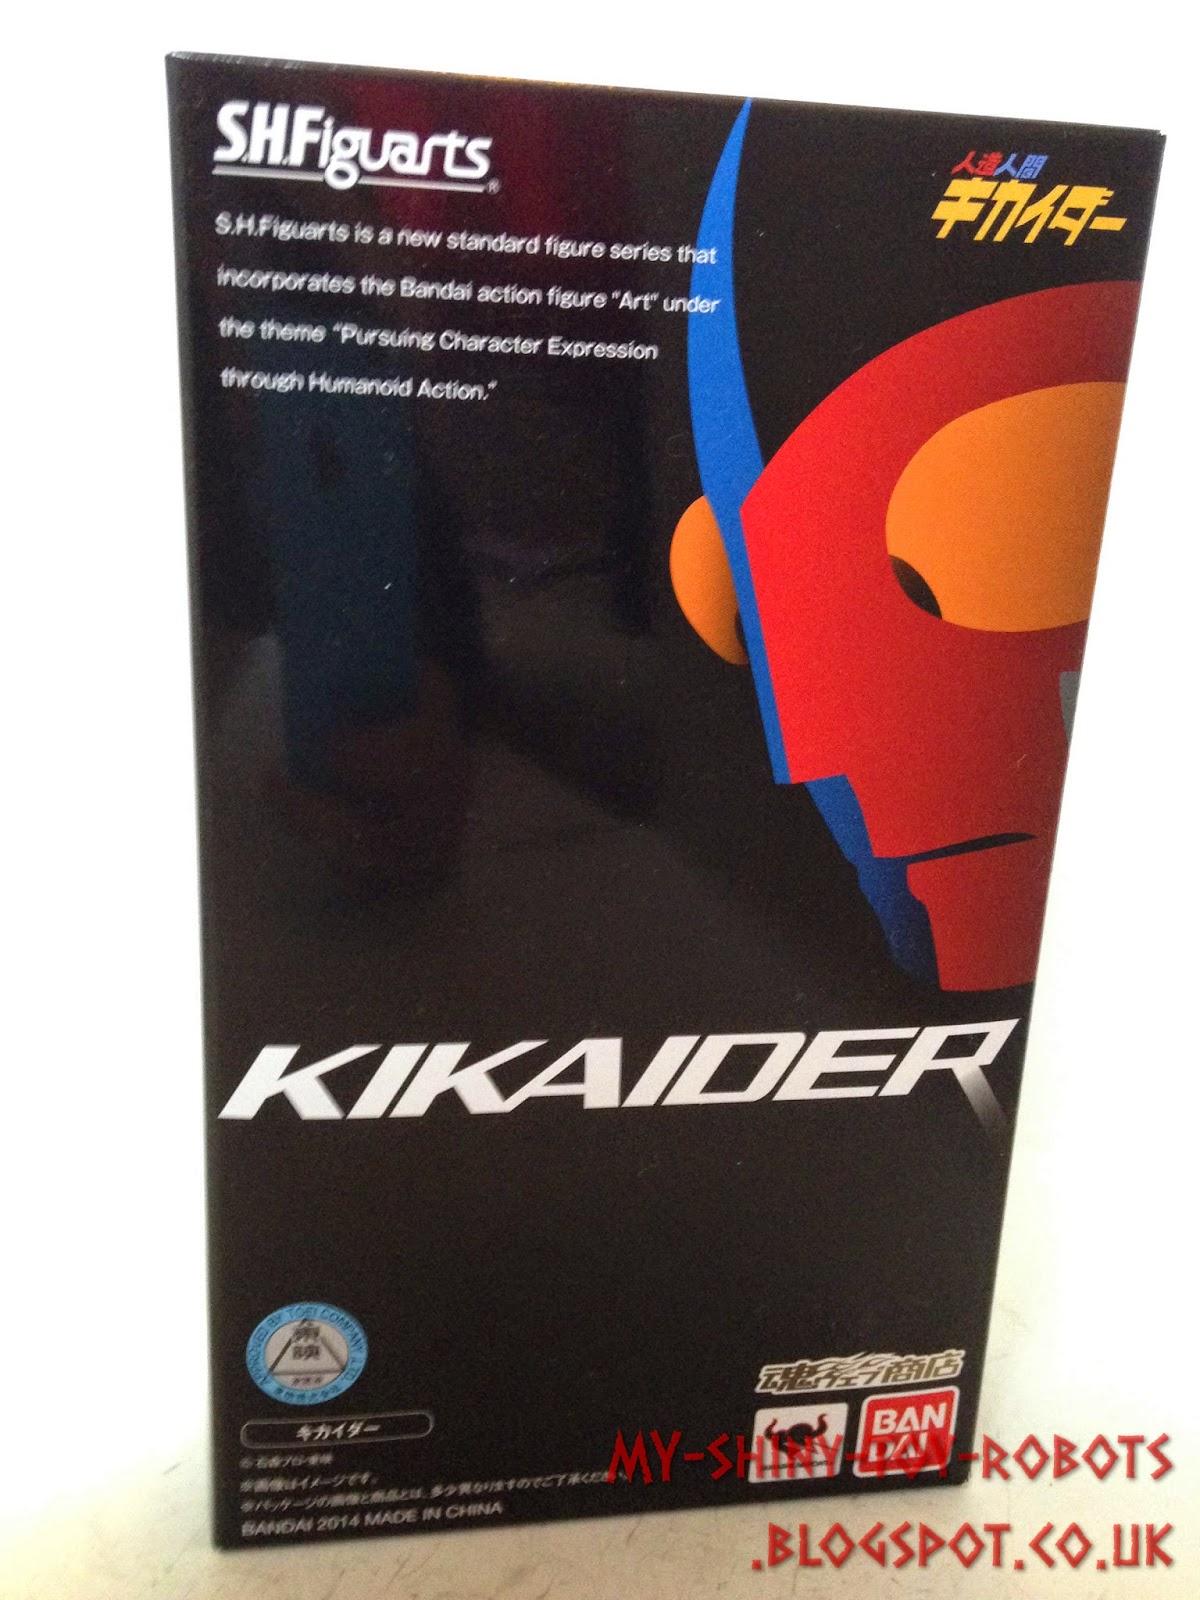 Kikaider box front